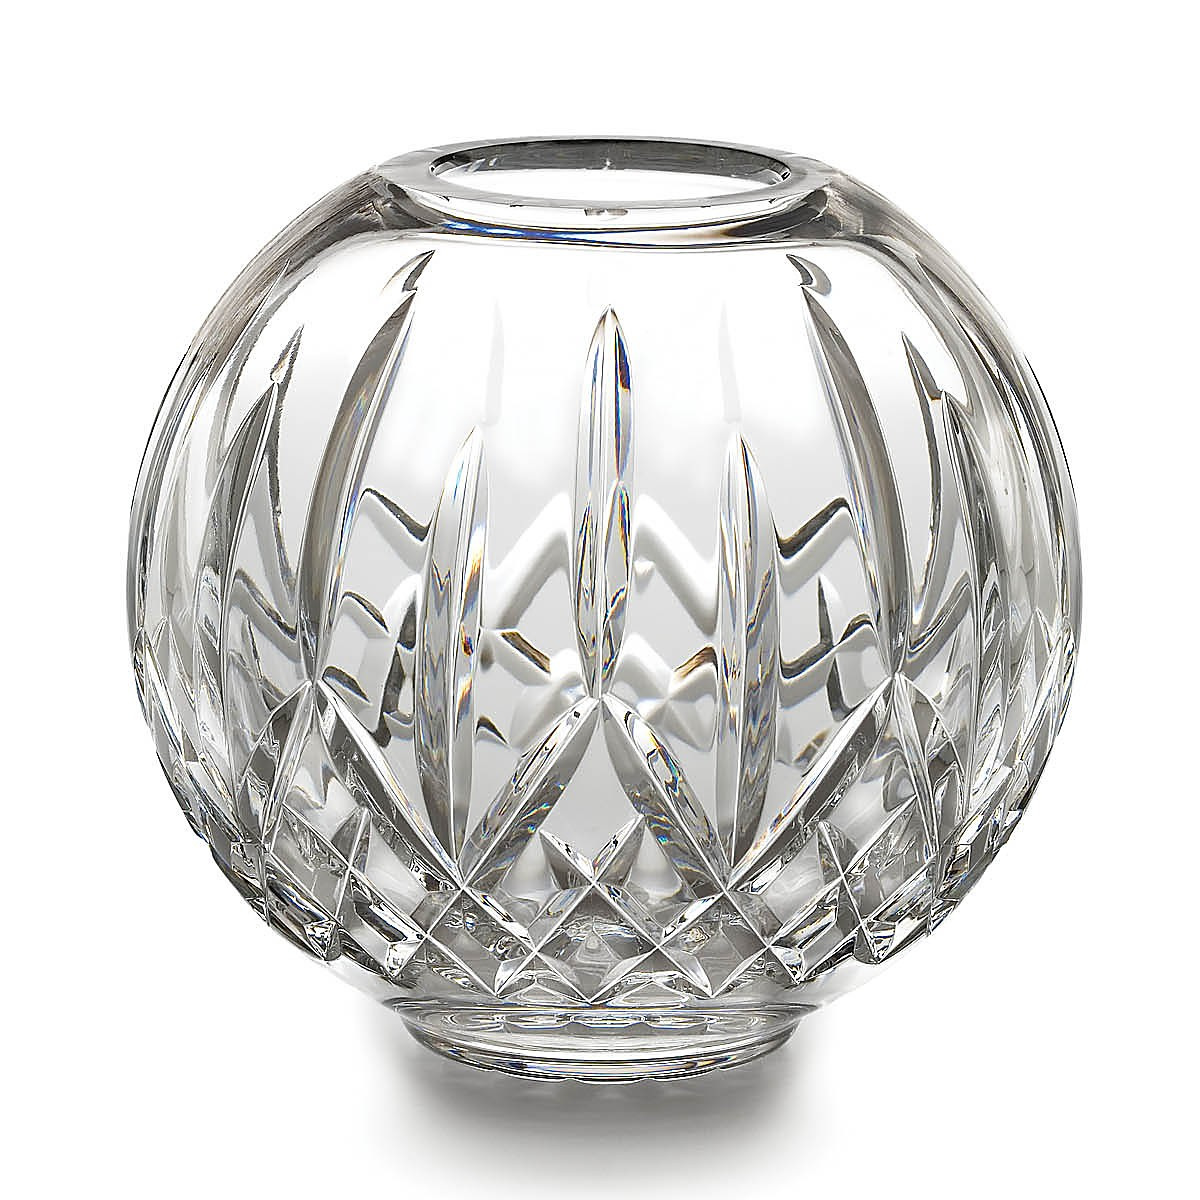 Waterfordcrystalcolorful waterford crystal lismore rose bowl lismore rose bowl vase by waterford reviewsmspy